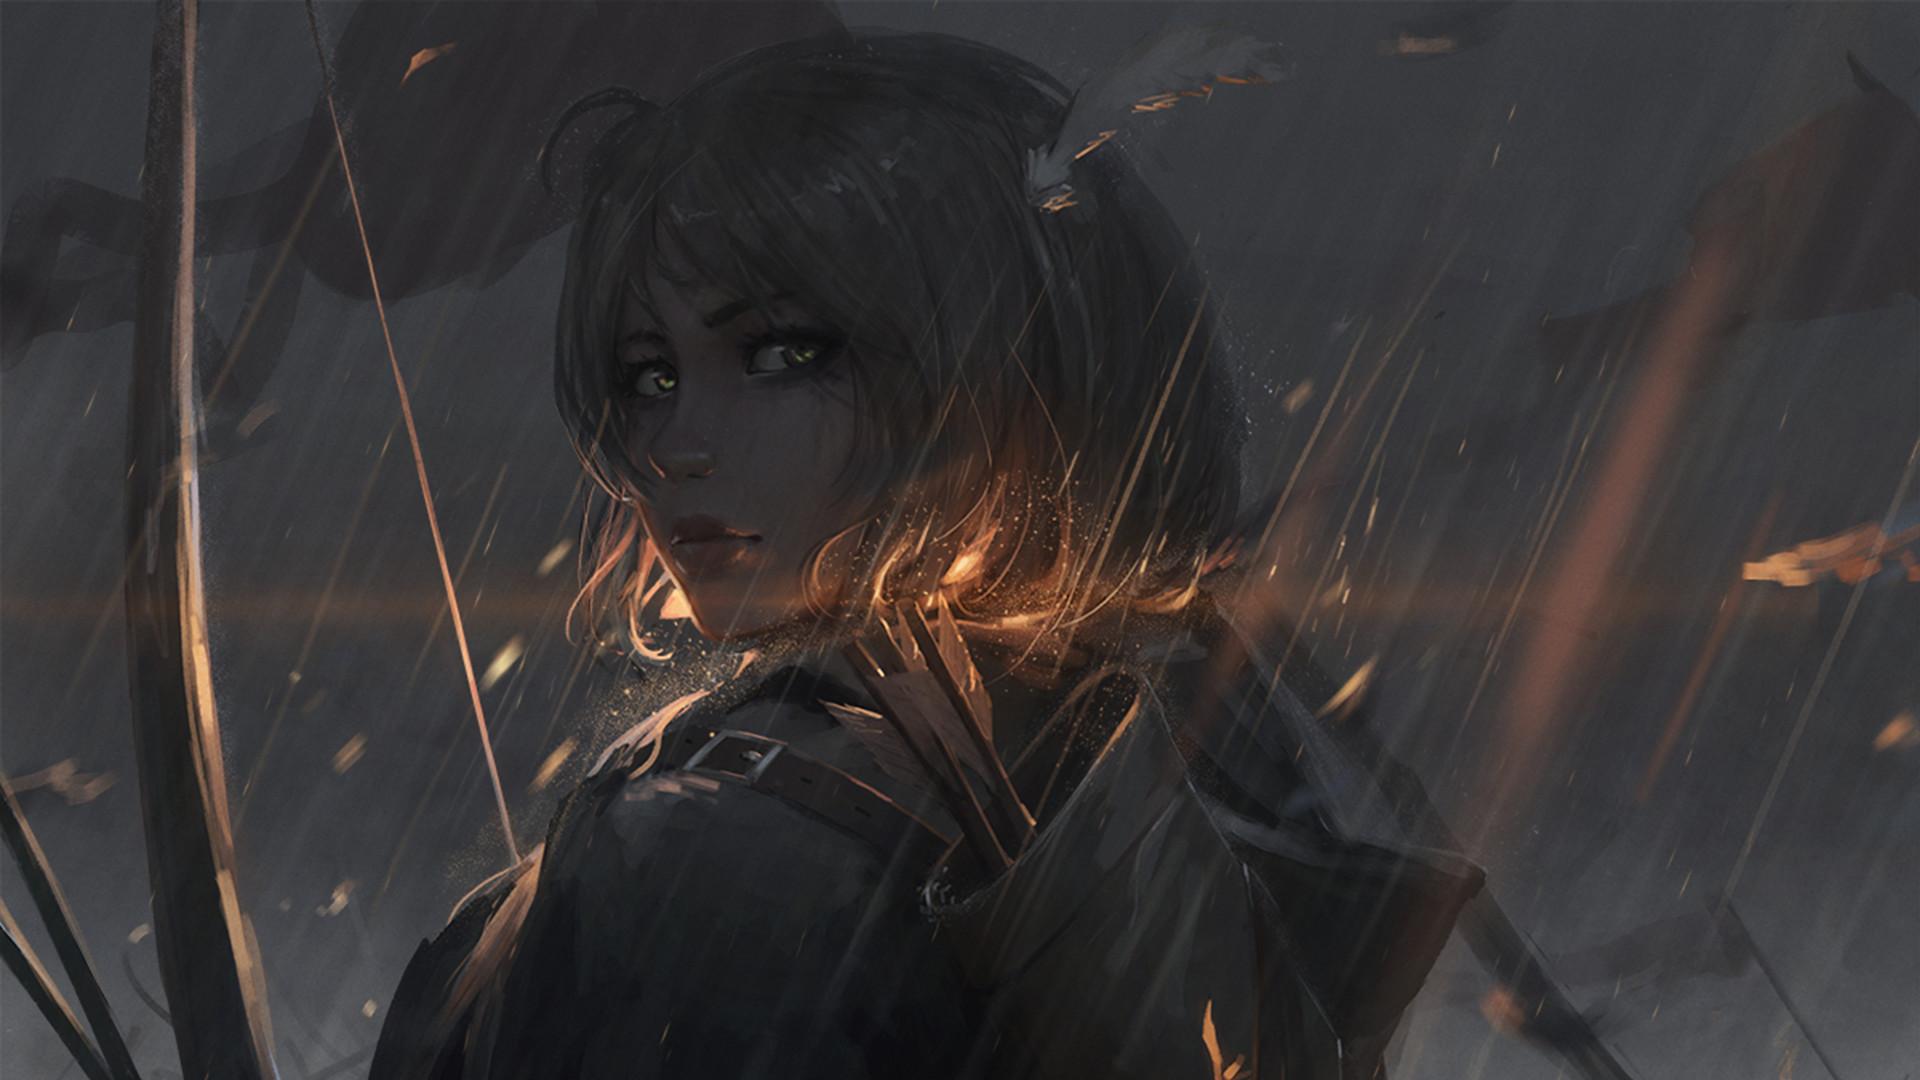 warrior, Artwork, Fantasy art, Bow and arrow